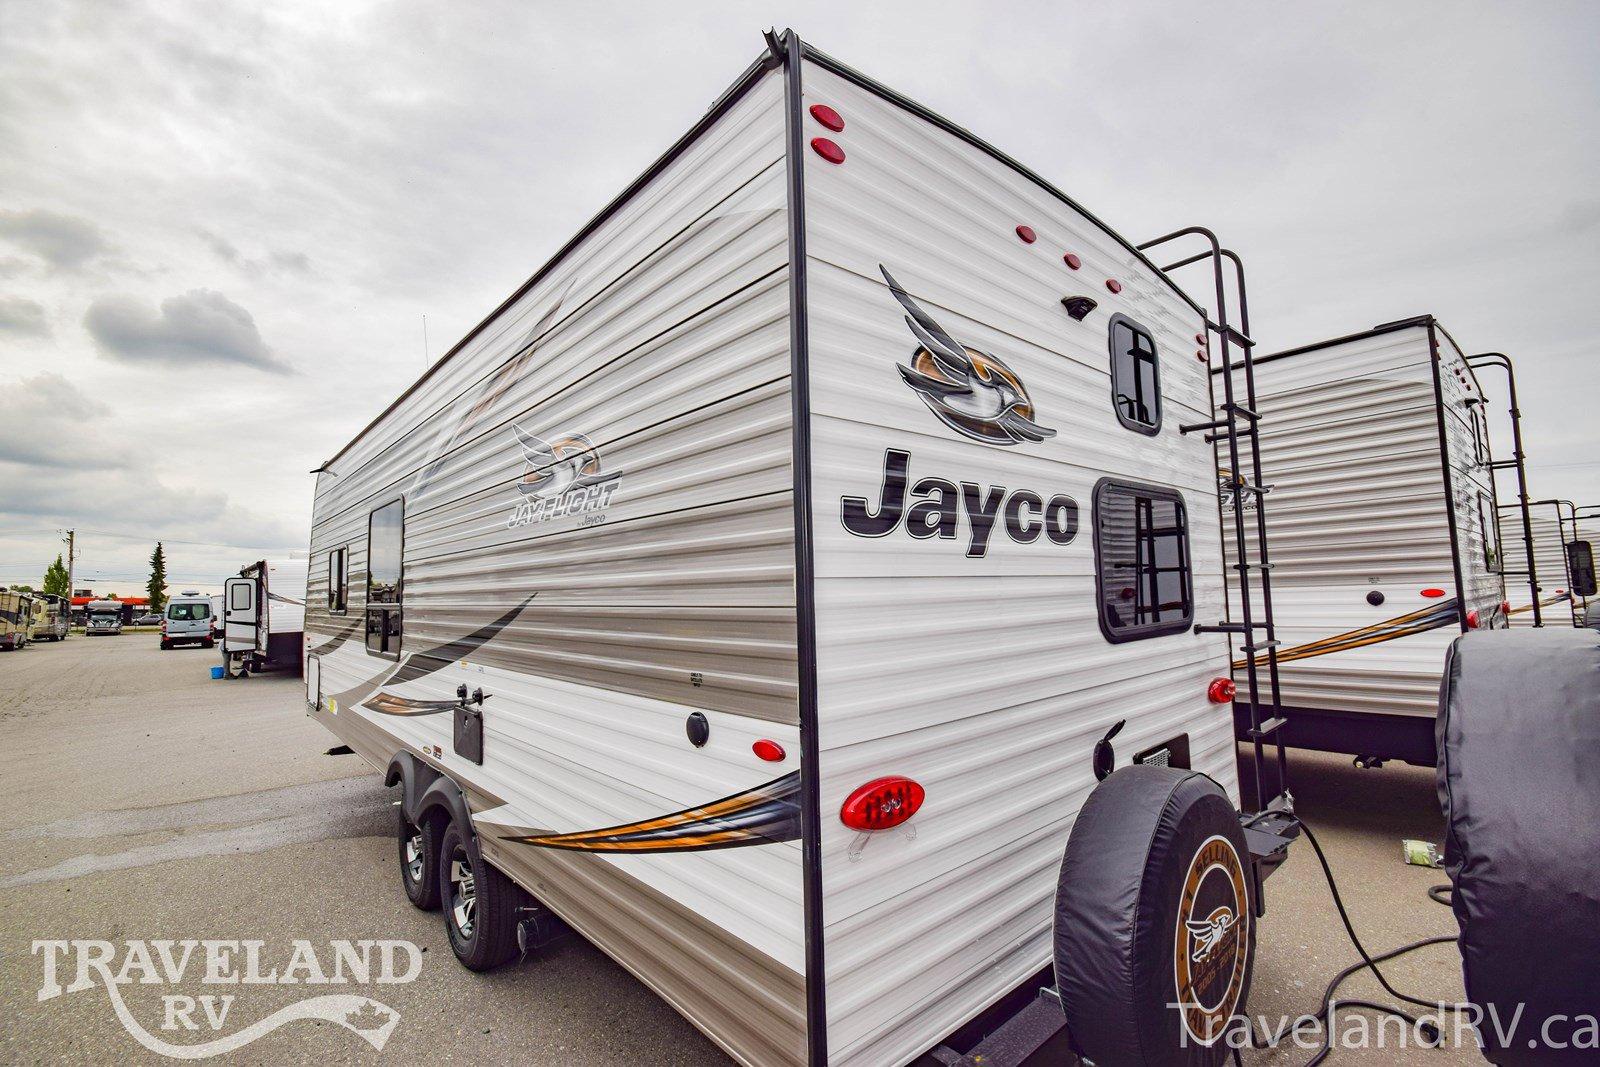 2020 Jayco Jayflight Rocky Mountain 224BHW Thumbnail